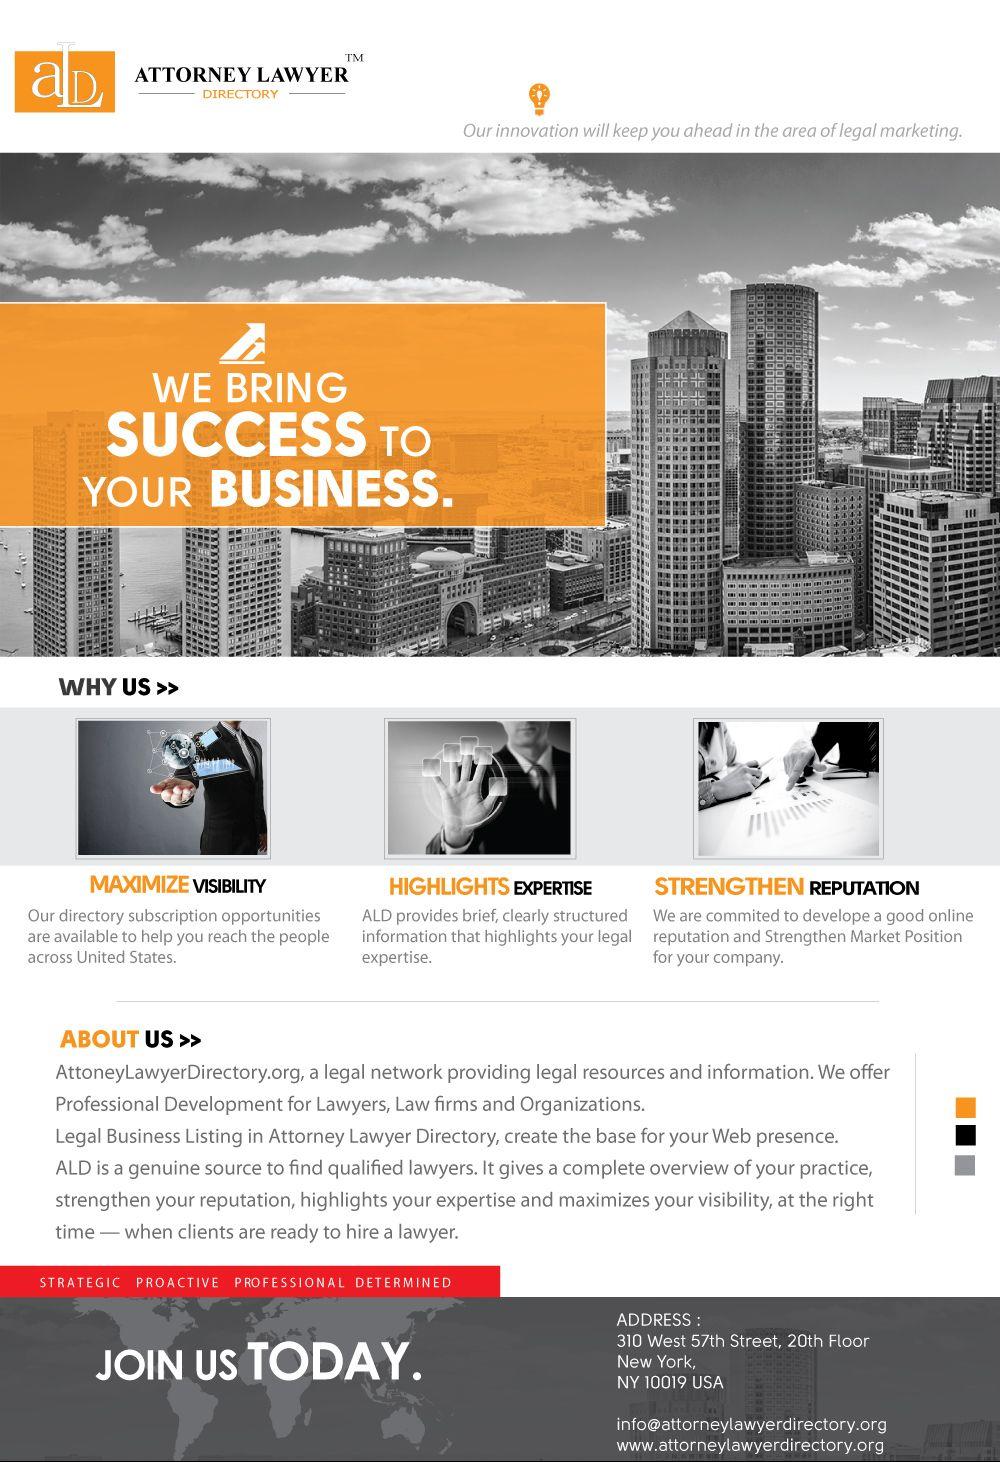 Attorney Lawyer Directory Flyer Http Attorneylawyerdirectory